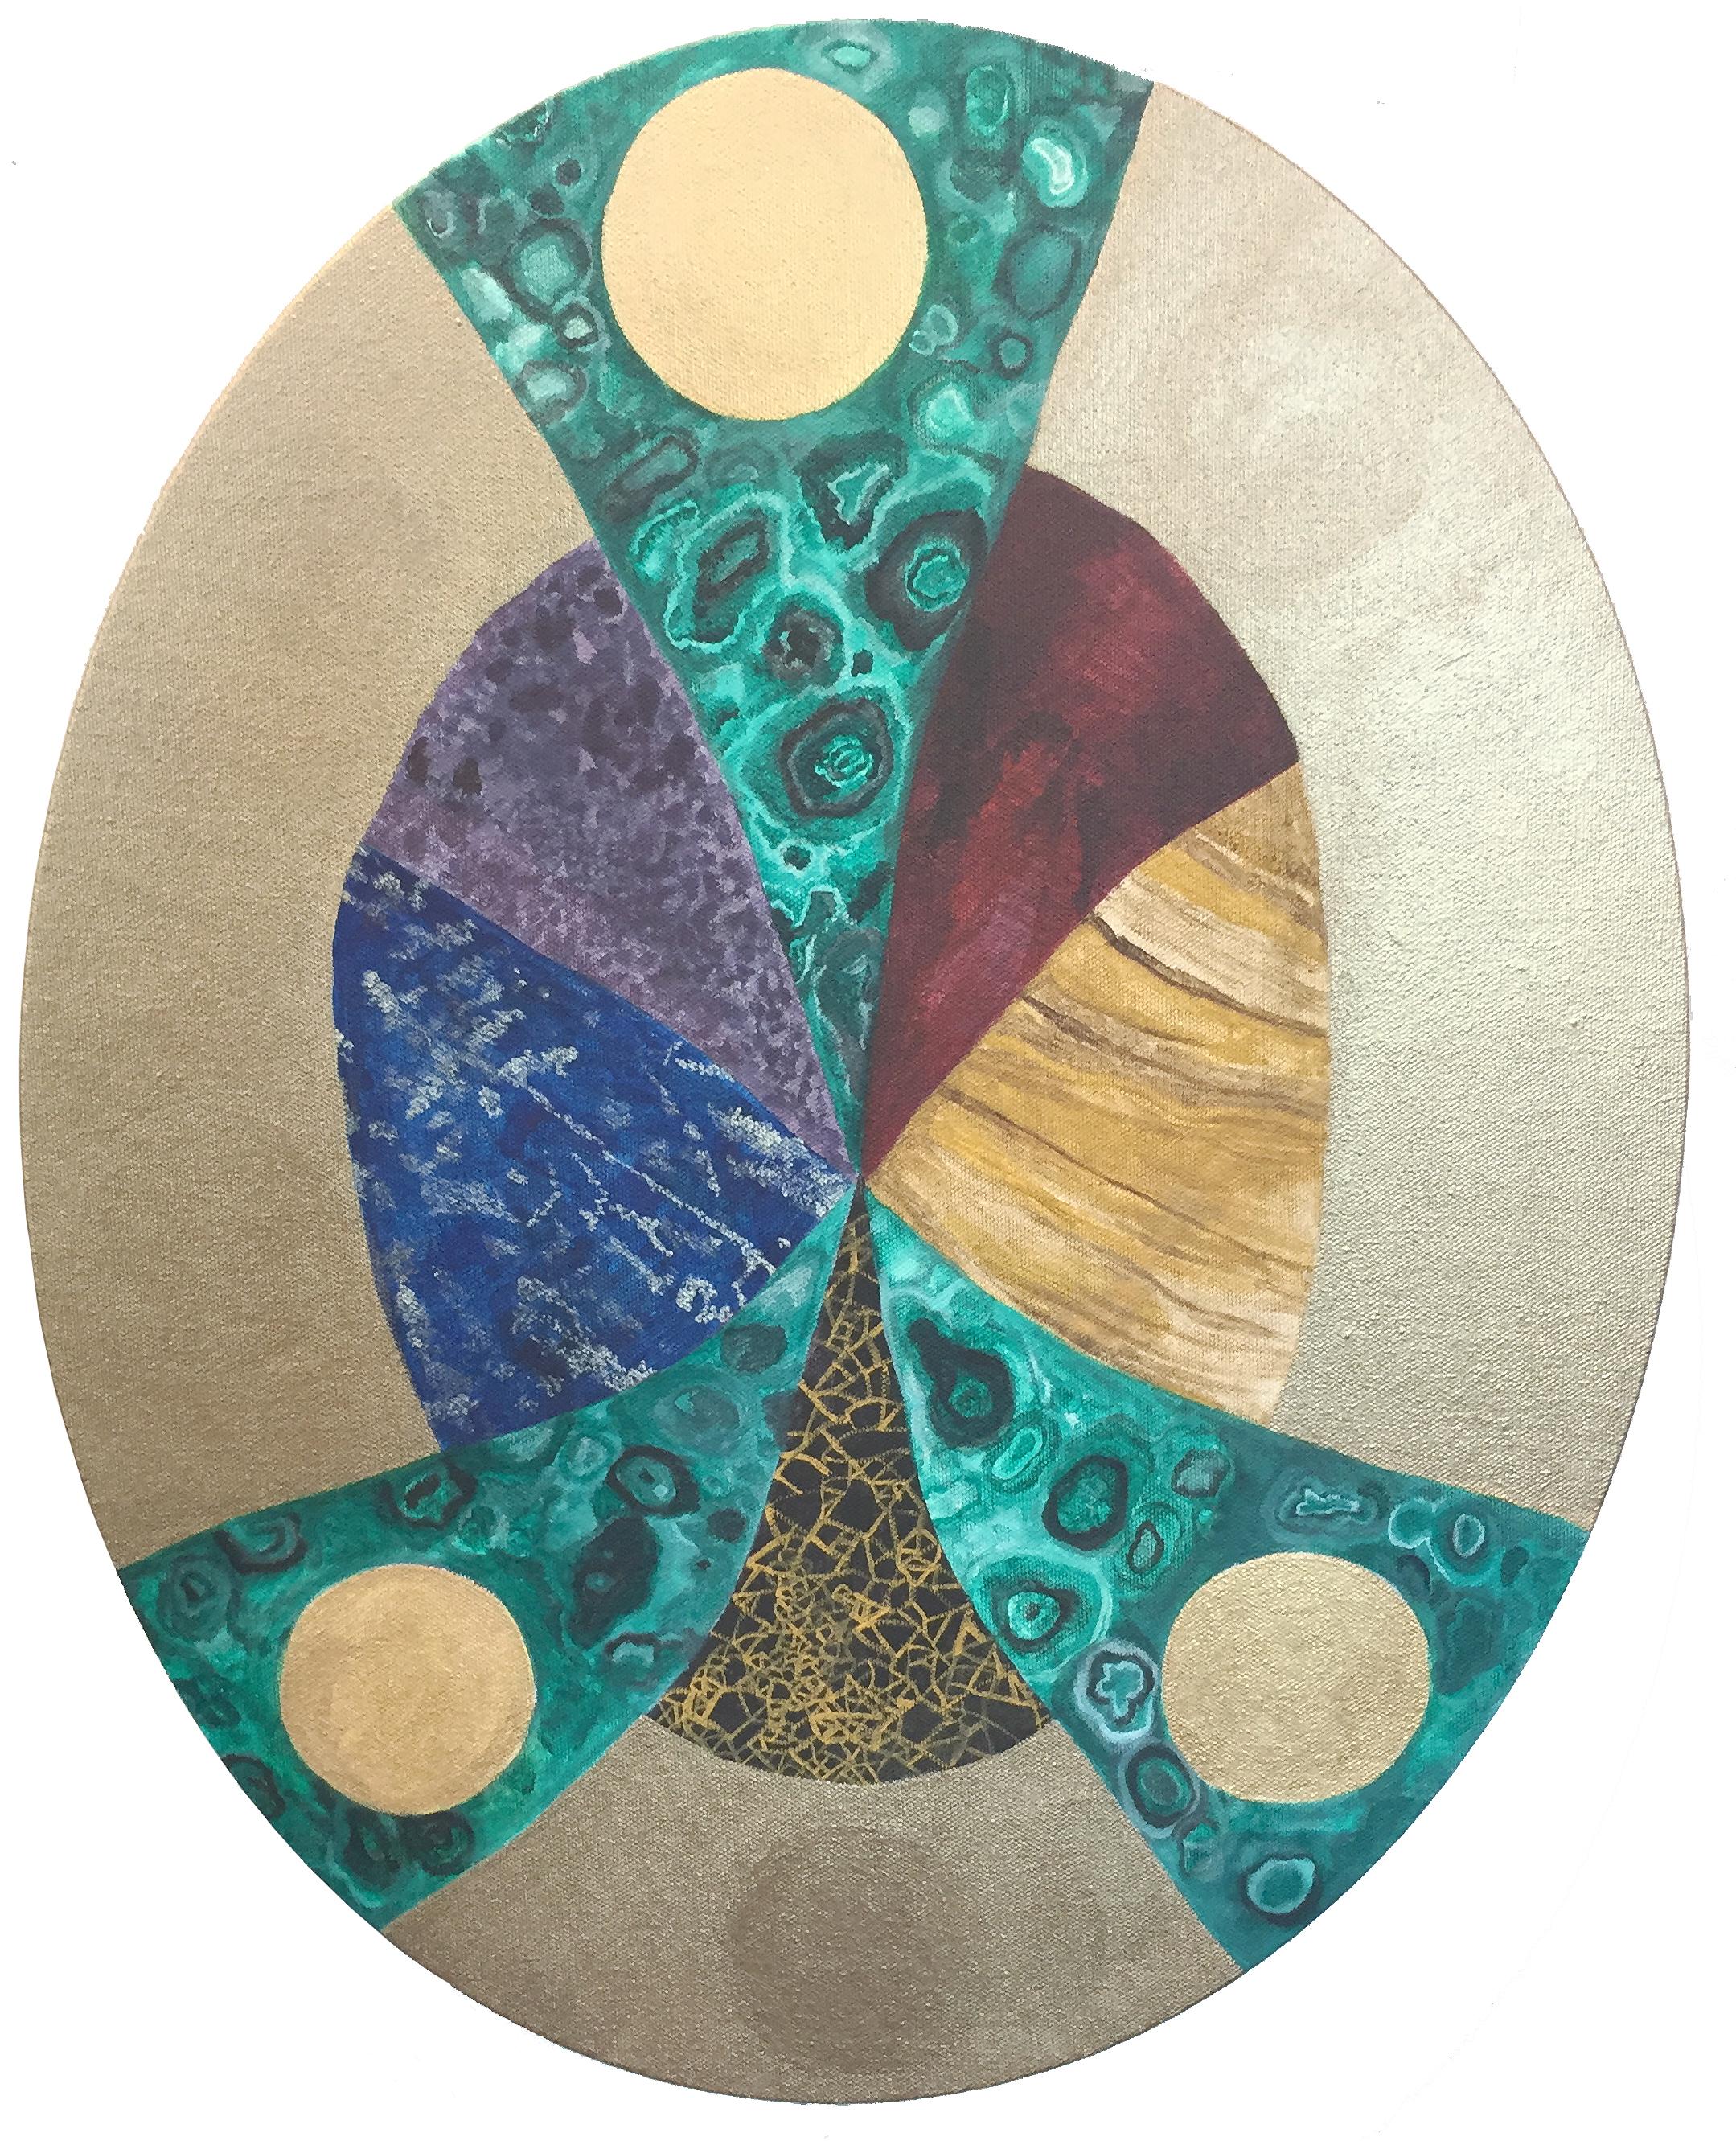 Healing Mandala   Leigh McCartne Garretty